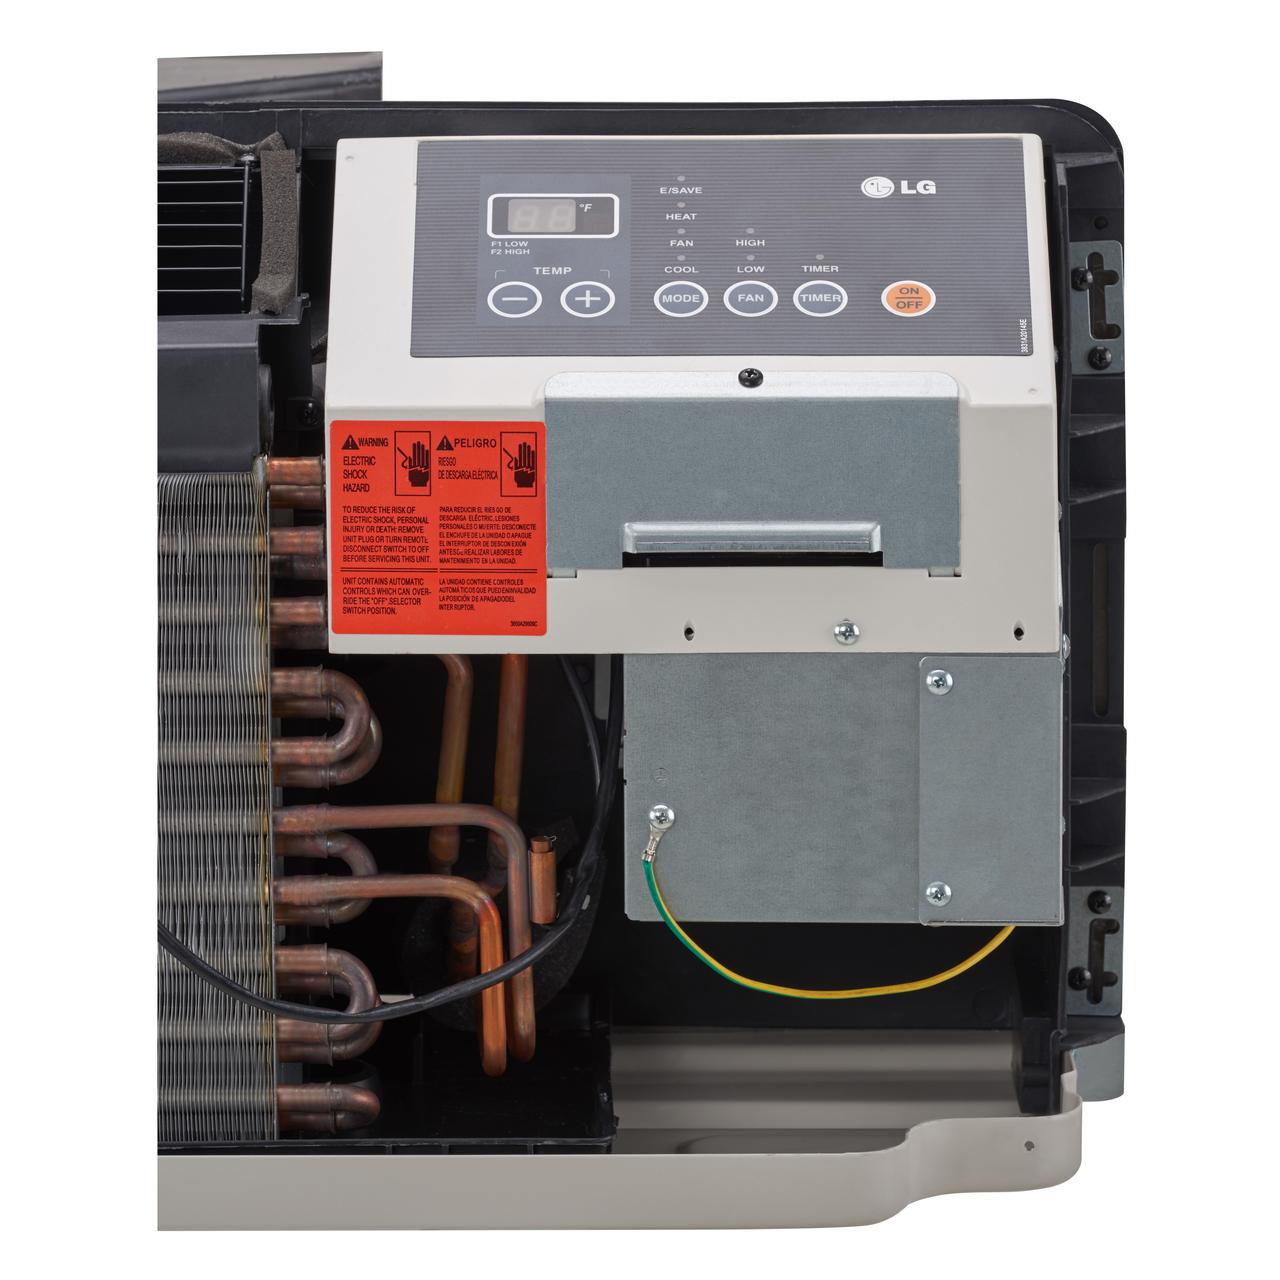 240v Electric Baseboard Heat Wiring Diagram Electrical Diy Trusted Lg Lp153hduc 15000 Btu Ptac Air Conditioner Pump